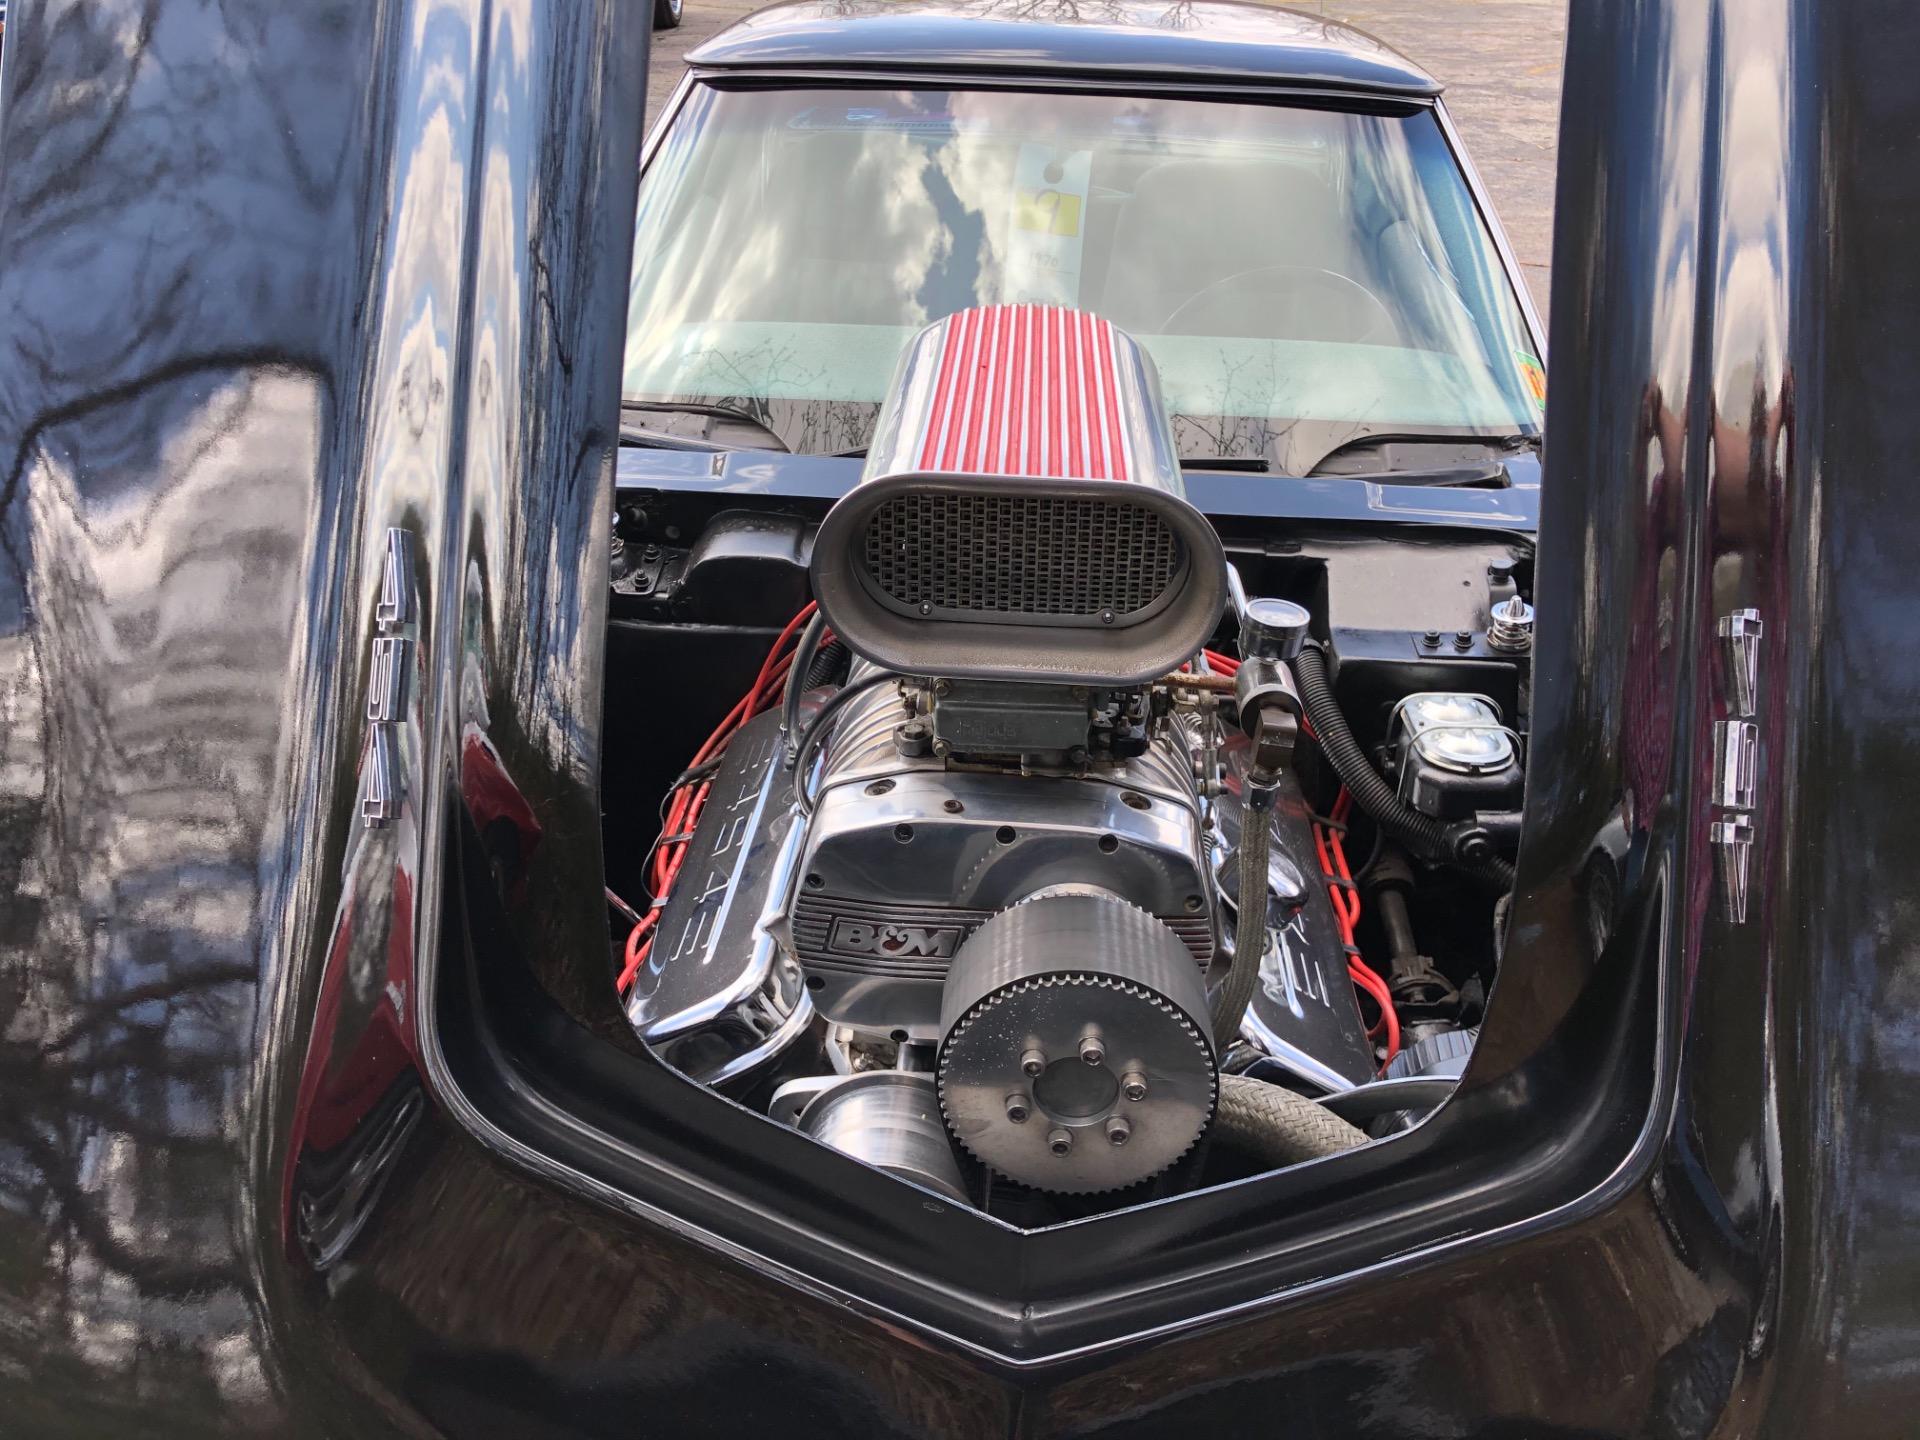 Used 1970 Chevrolet Corvette -SUPERCHARGED-BDS BLOWER-HIGH HORSEPOWER-NOSTALGIC SHARK-SEE VIDEO | Mundelein, IL